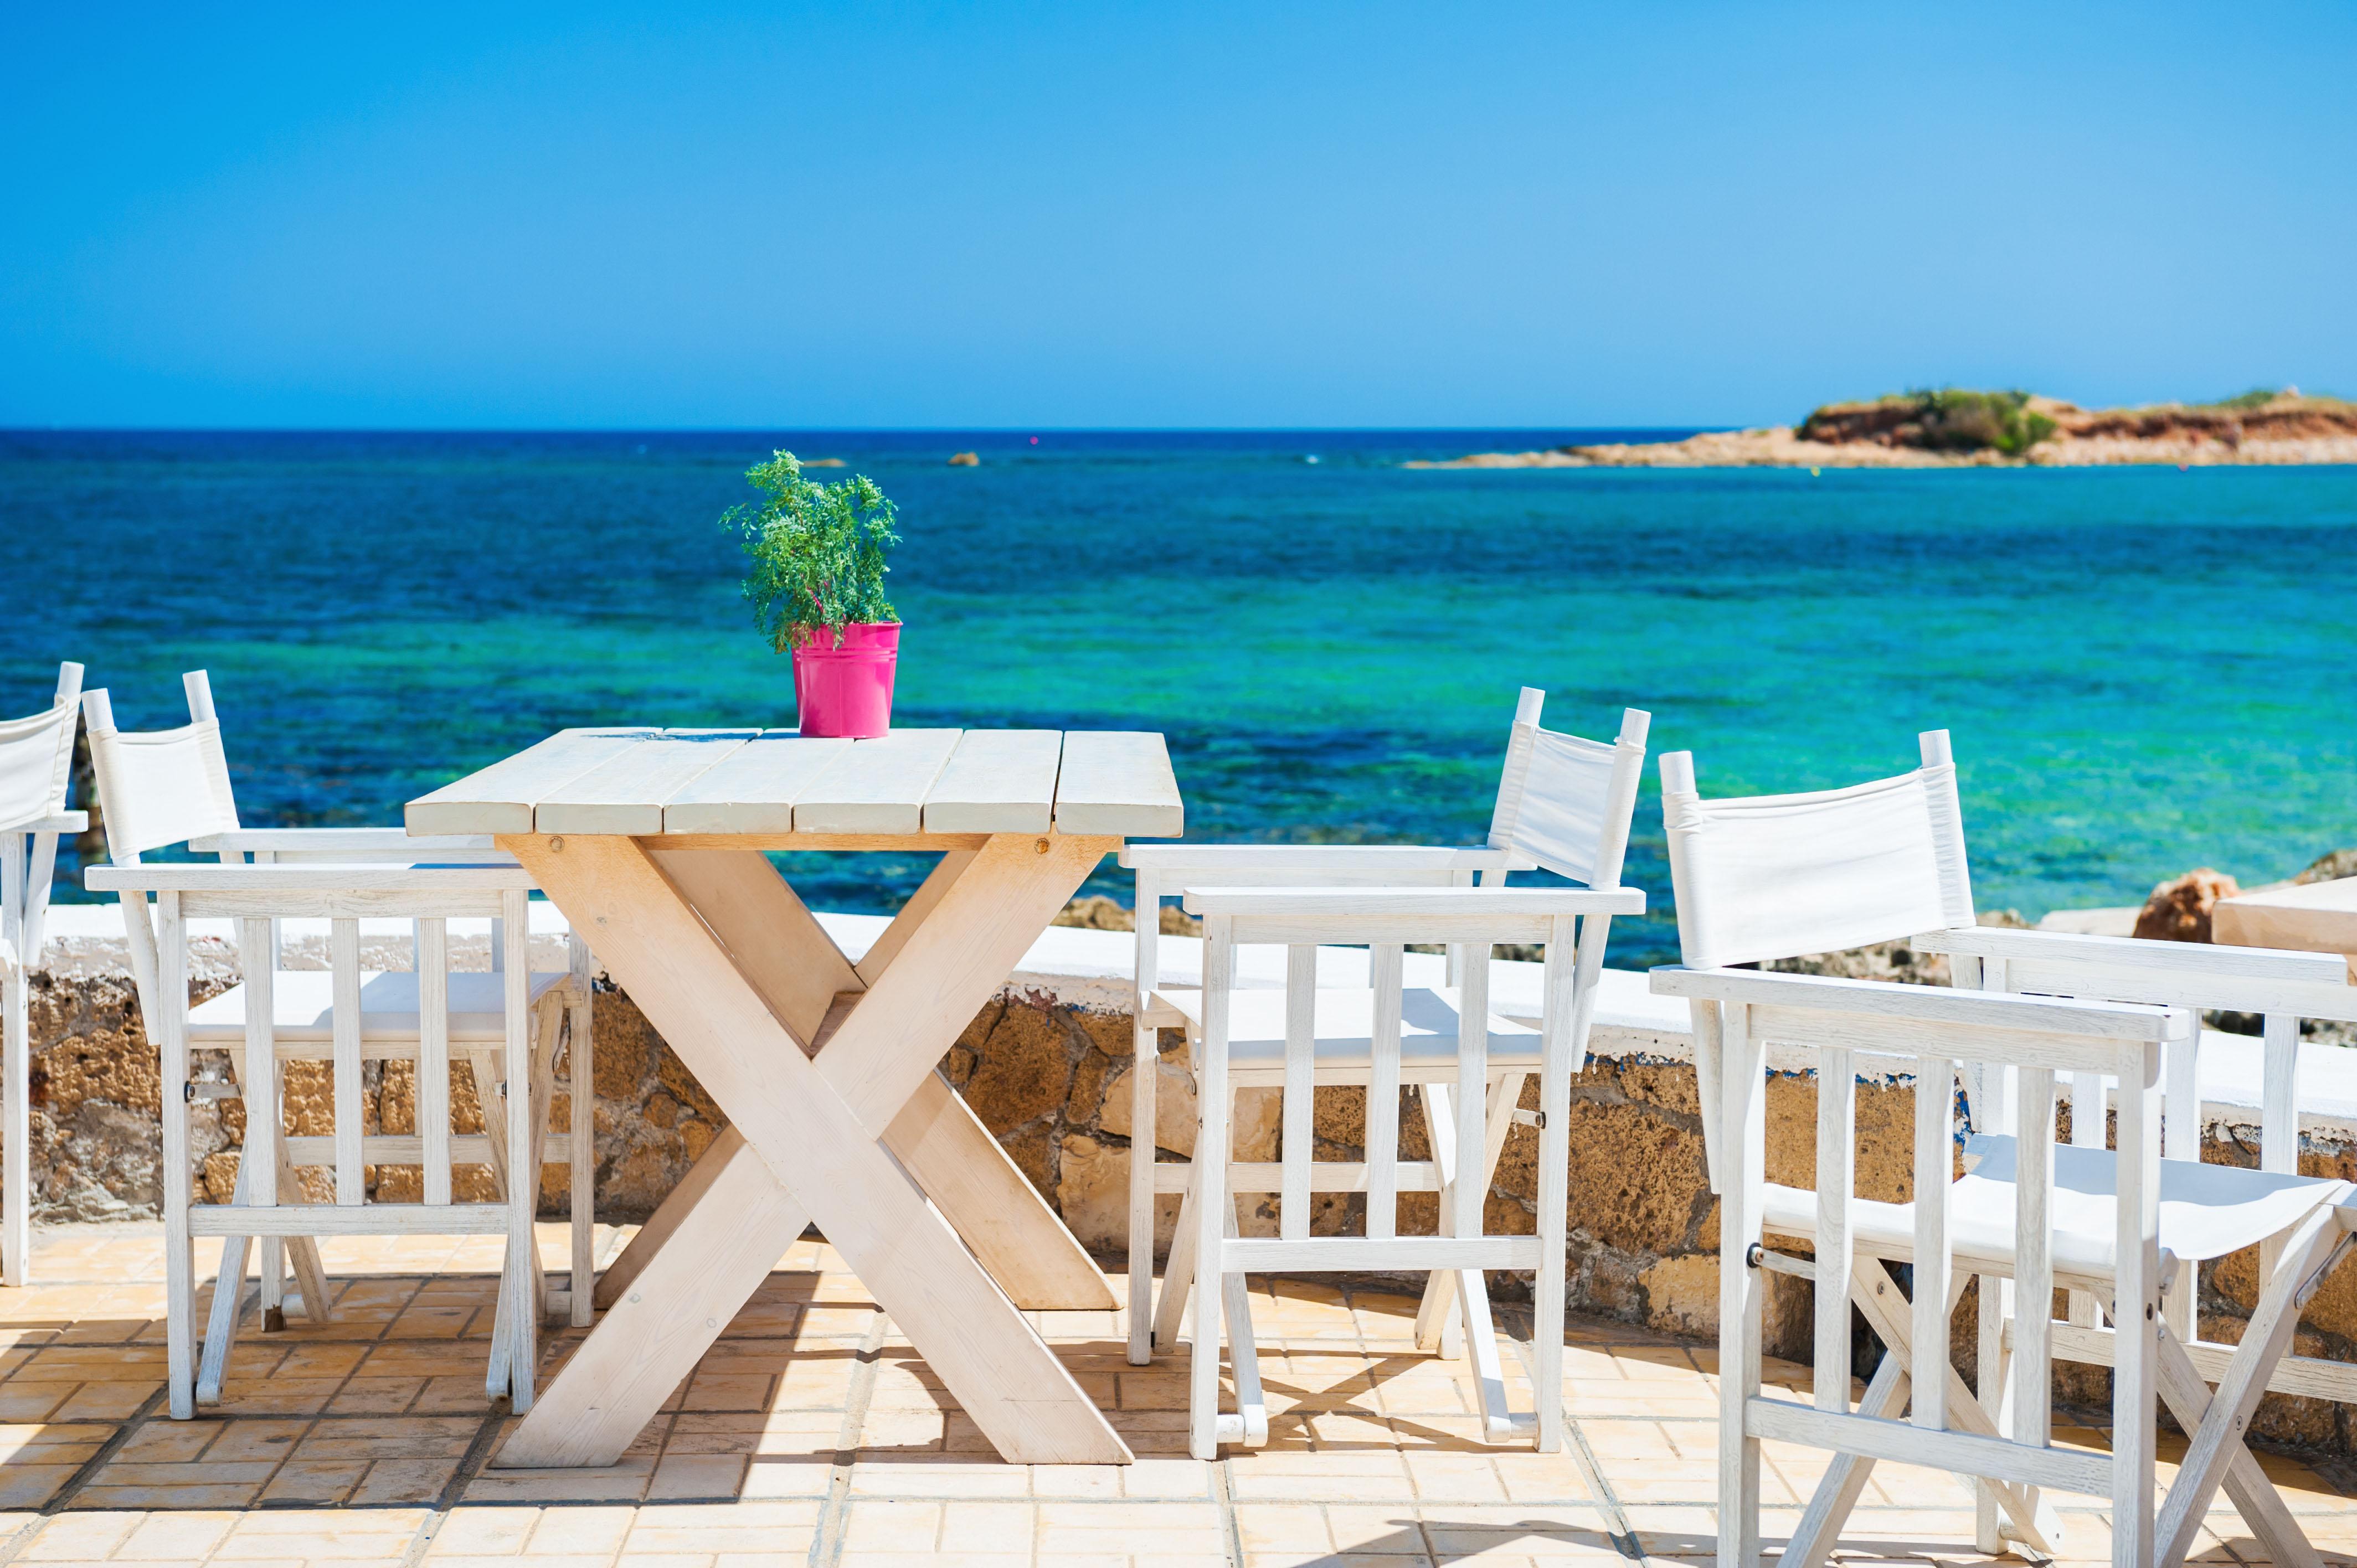 How to Reach Ikaros Beach in Malia Crete maps greece crete google